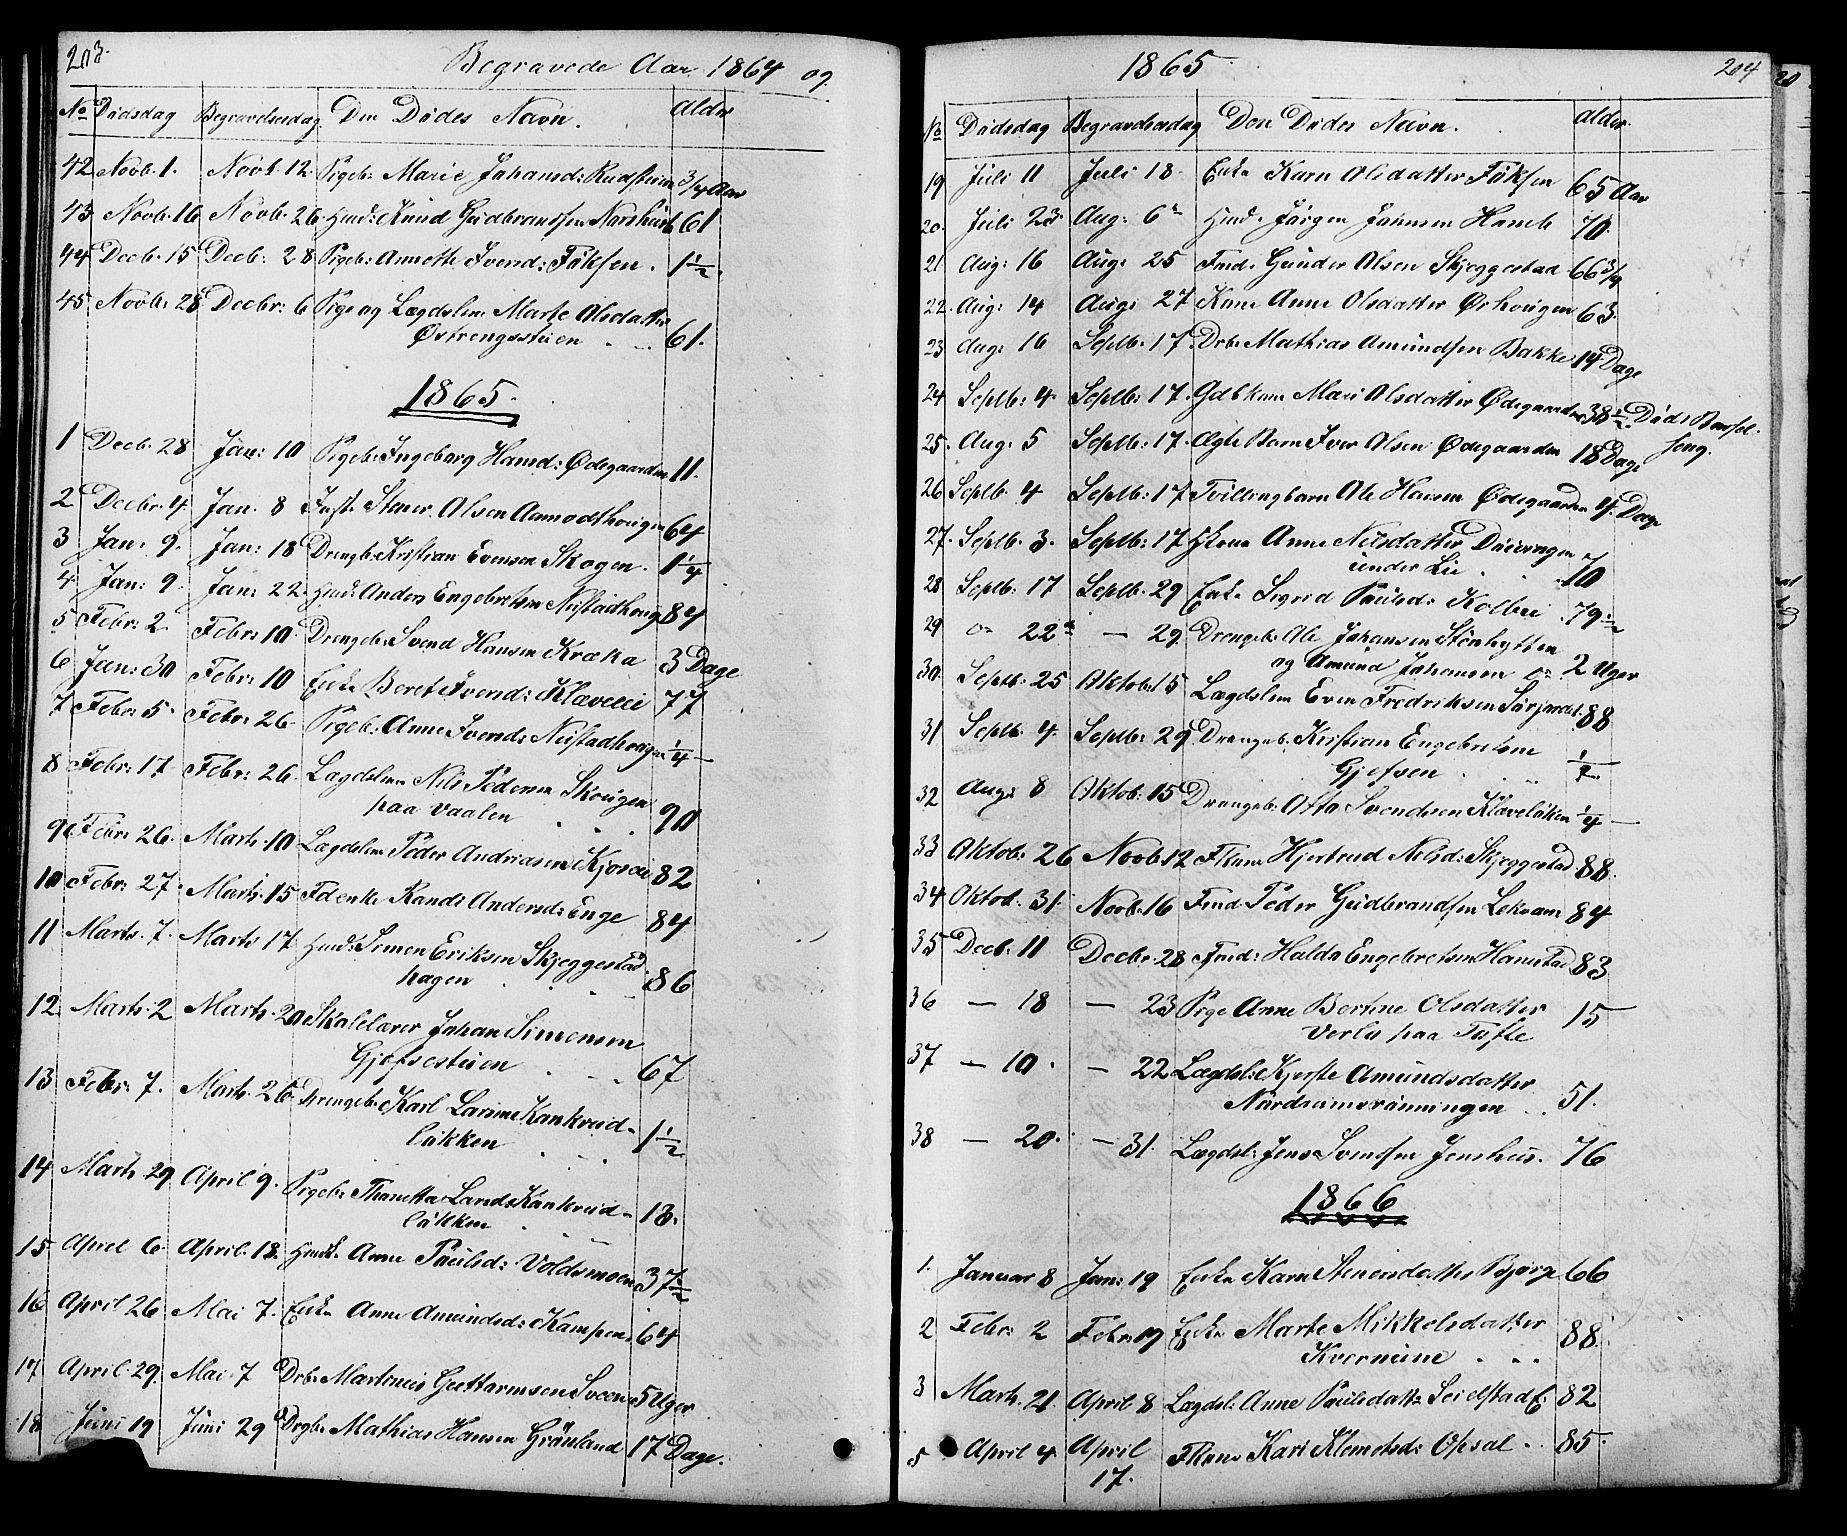 SAH, Østre Gausdal prestekontor, Klokkerbok nr. 1, 1863-1893, s. 203-204